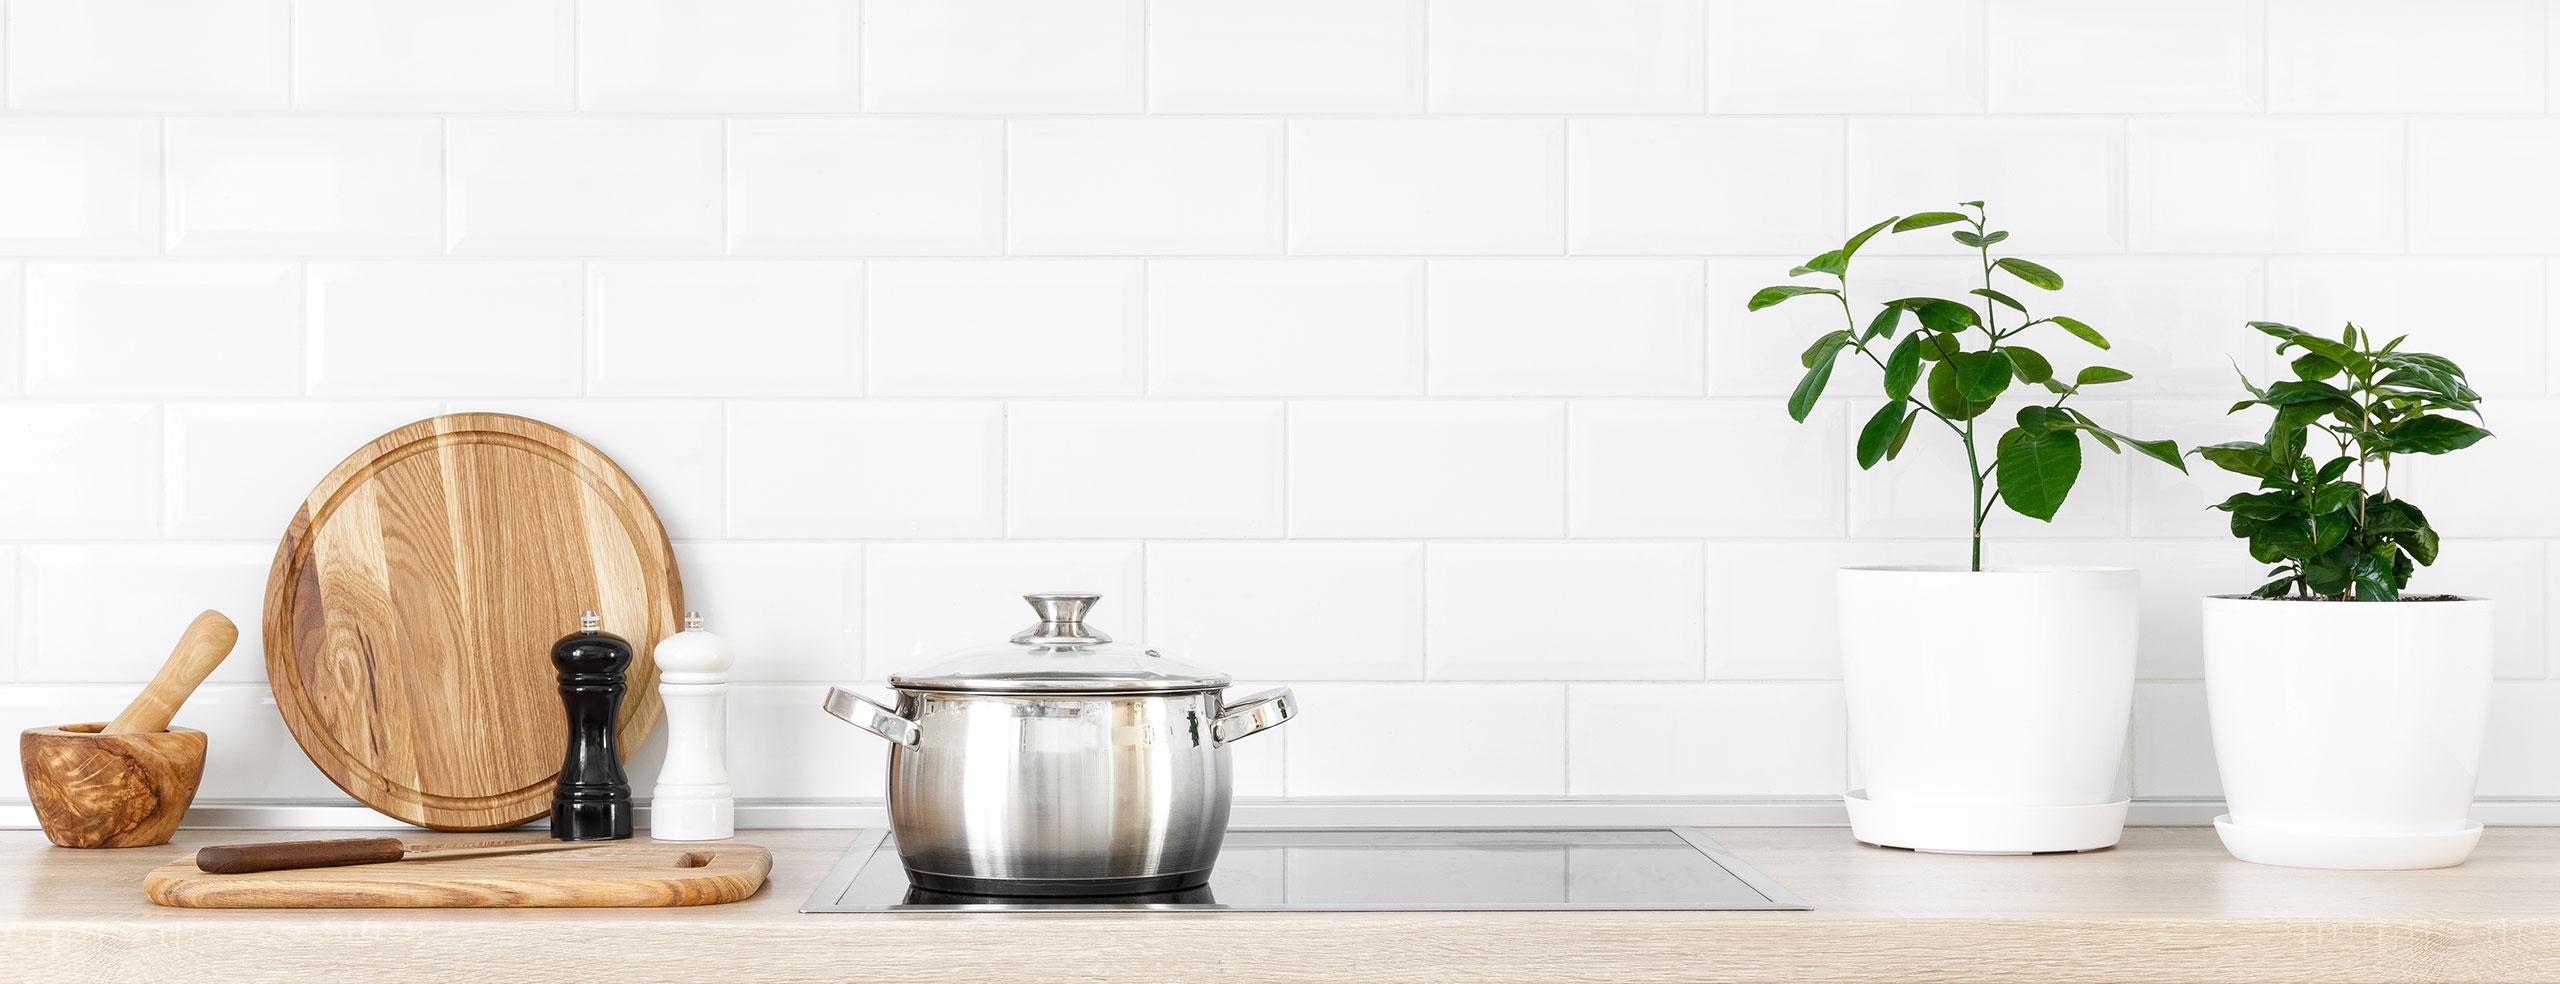 TasteOverTime - Blog & Recipes - Soups